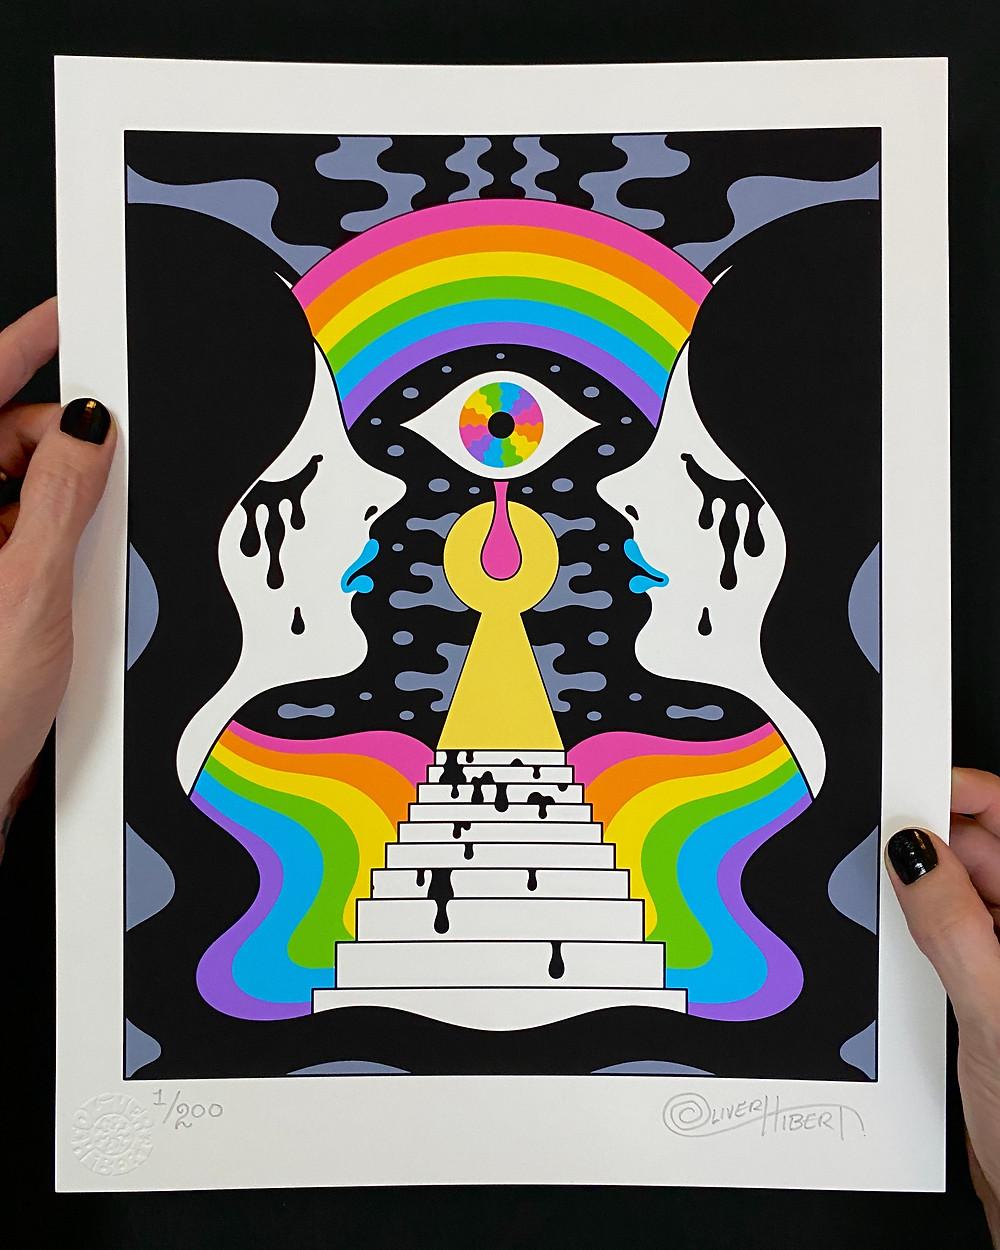 Oliver Hibert - Double Daydreem Print